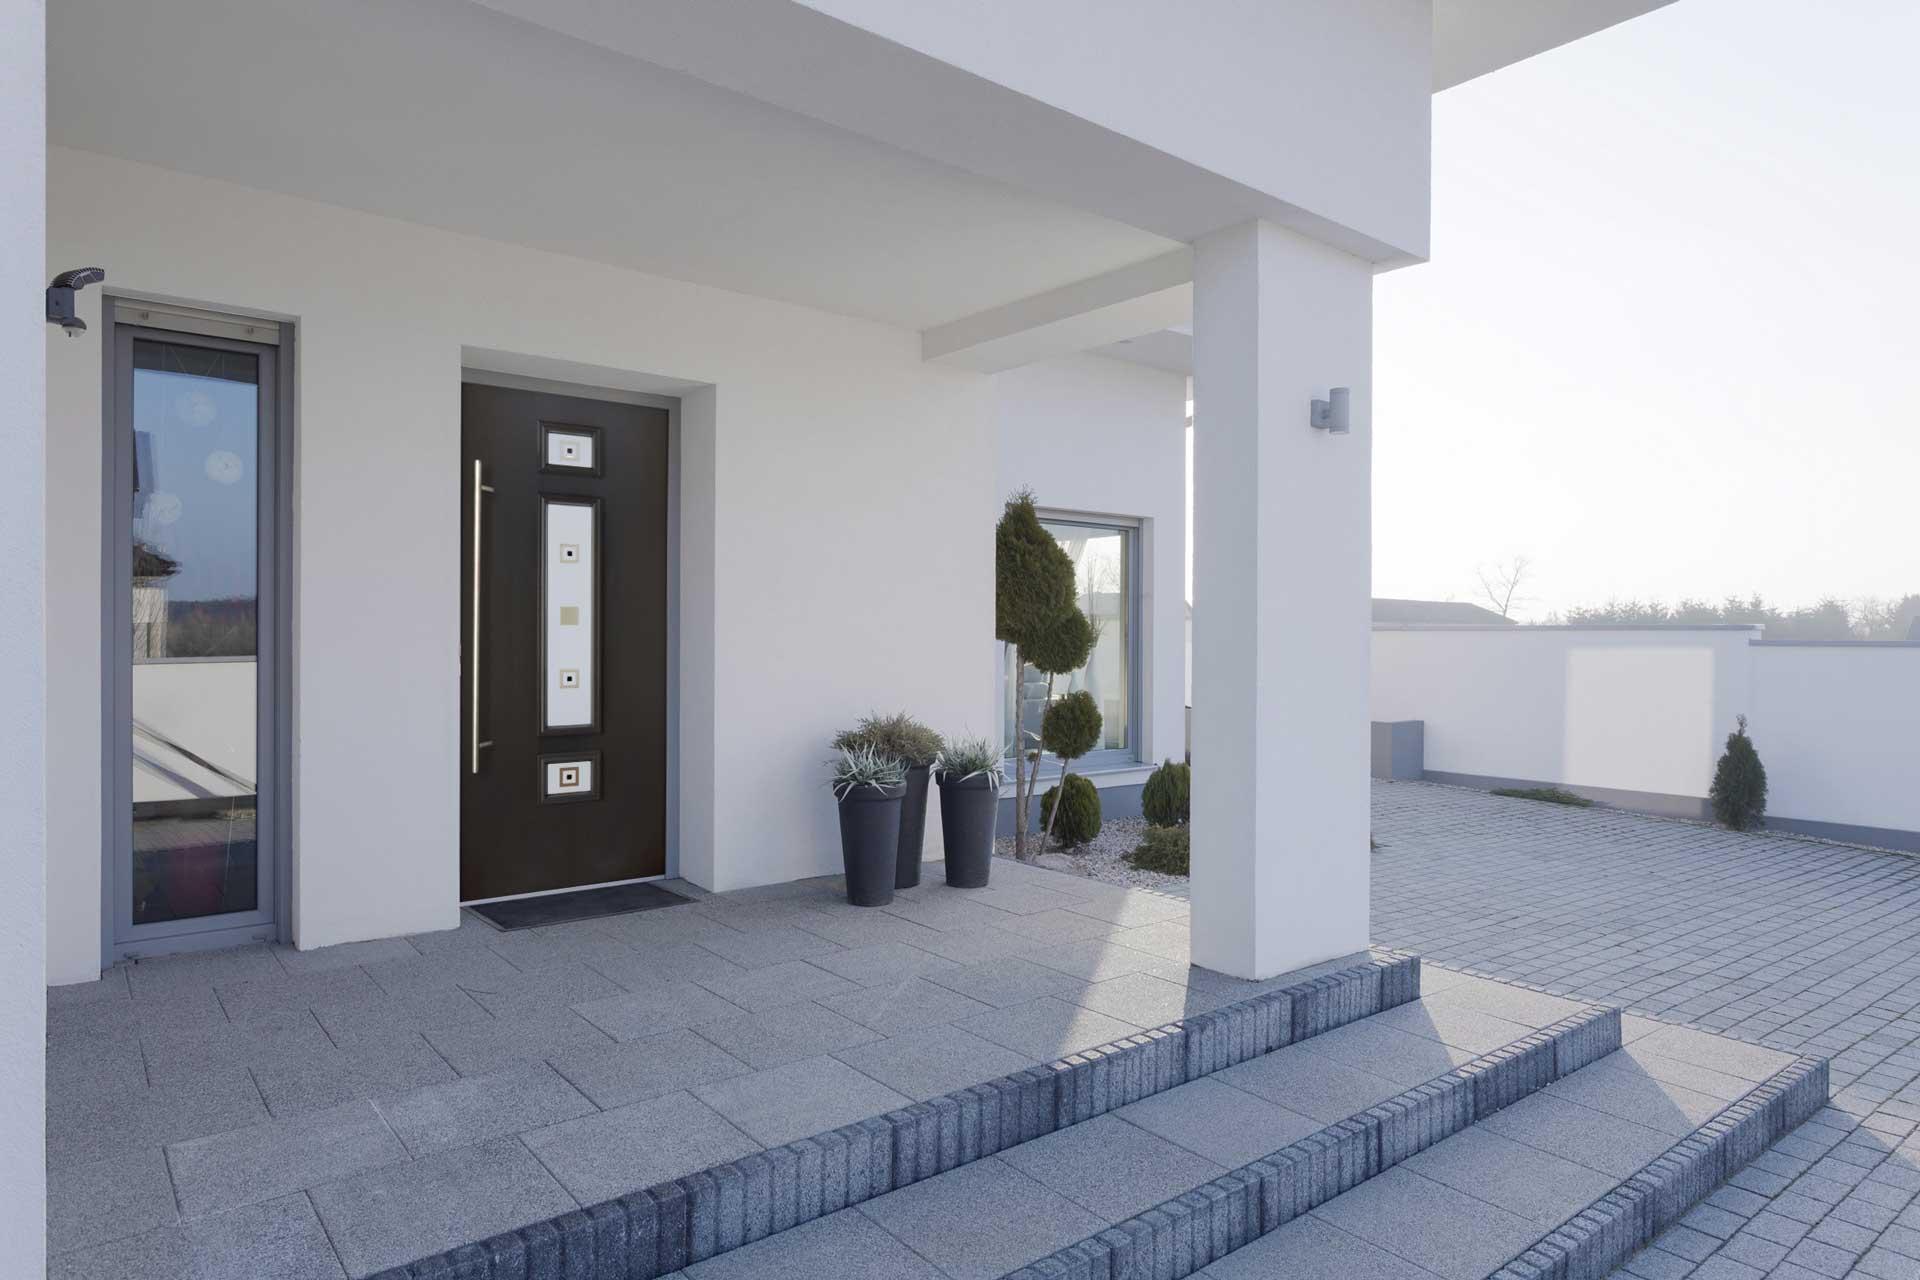 composite exterior doors royal leamington spa